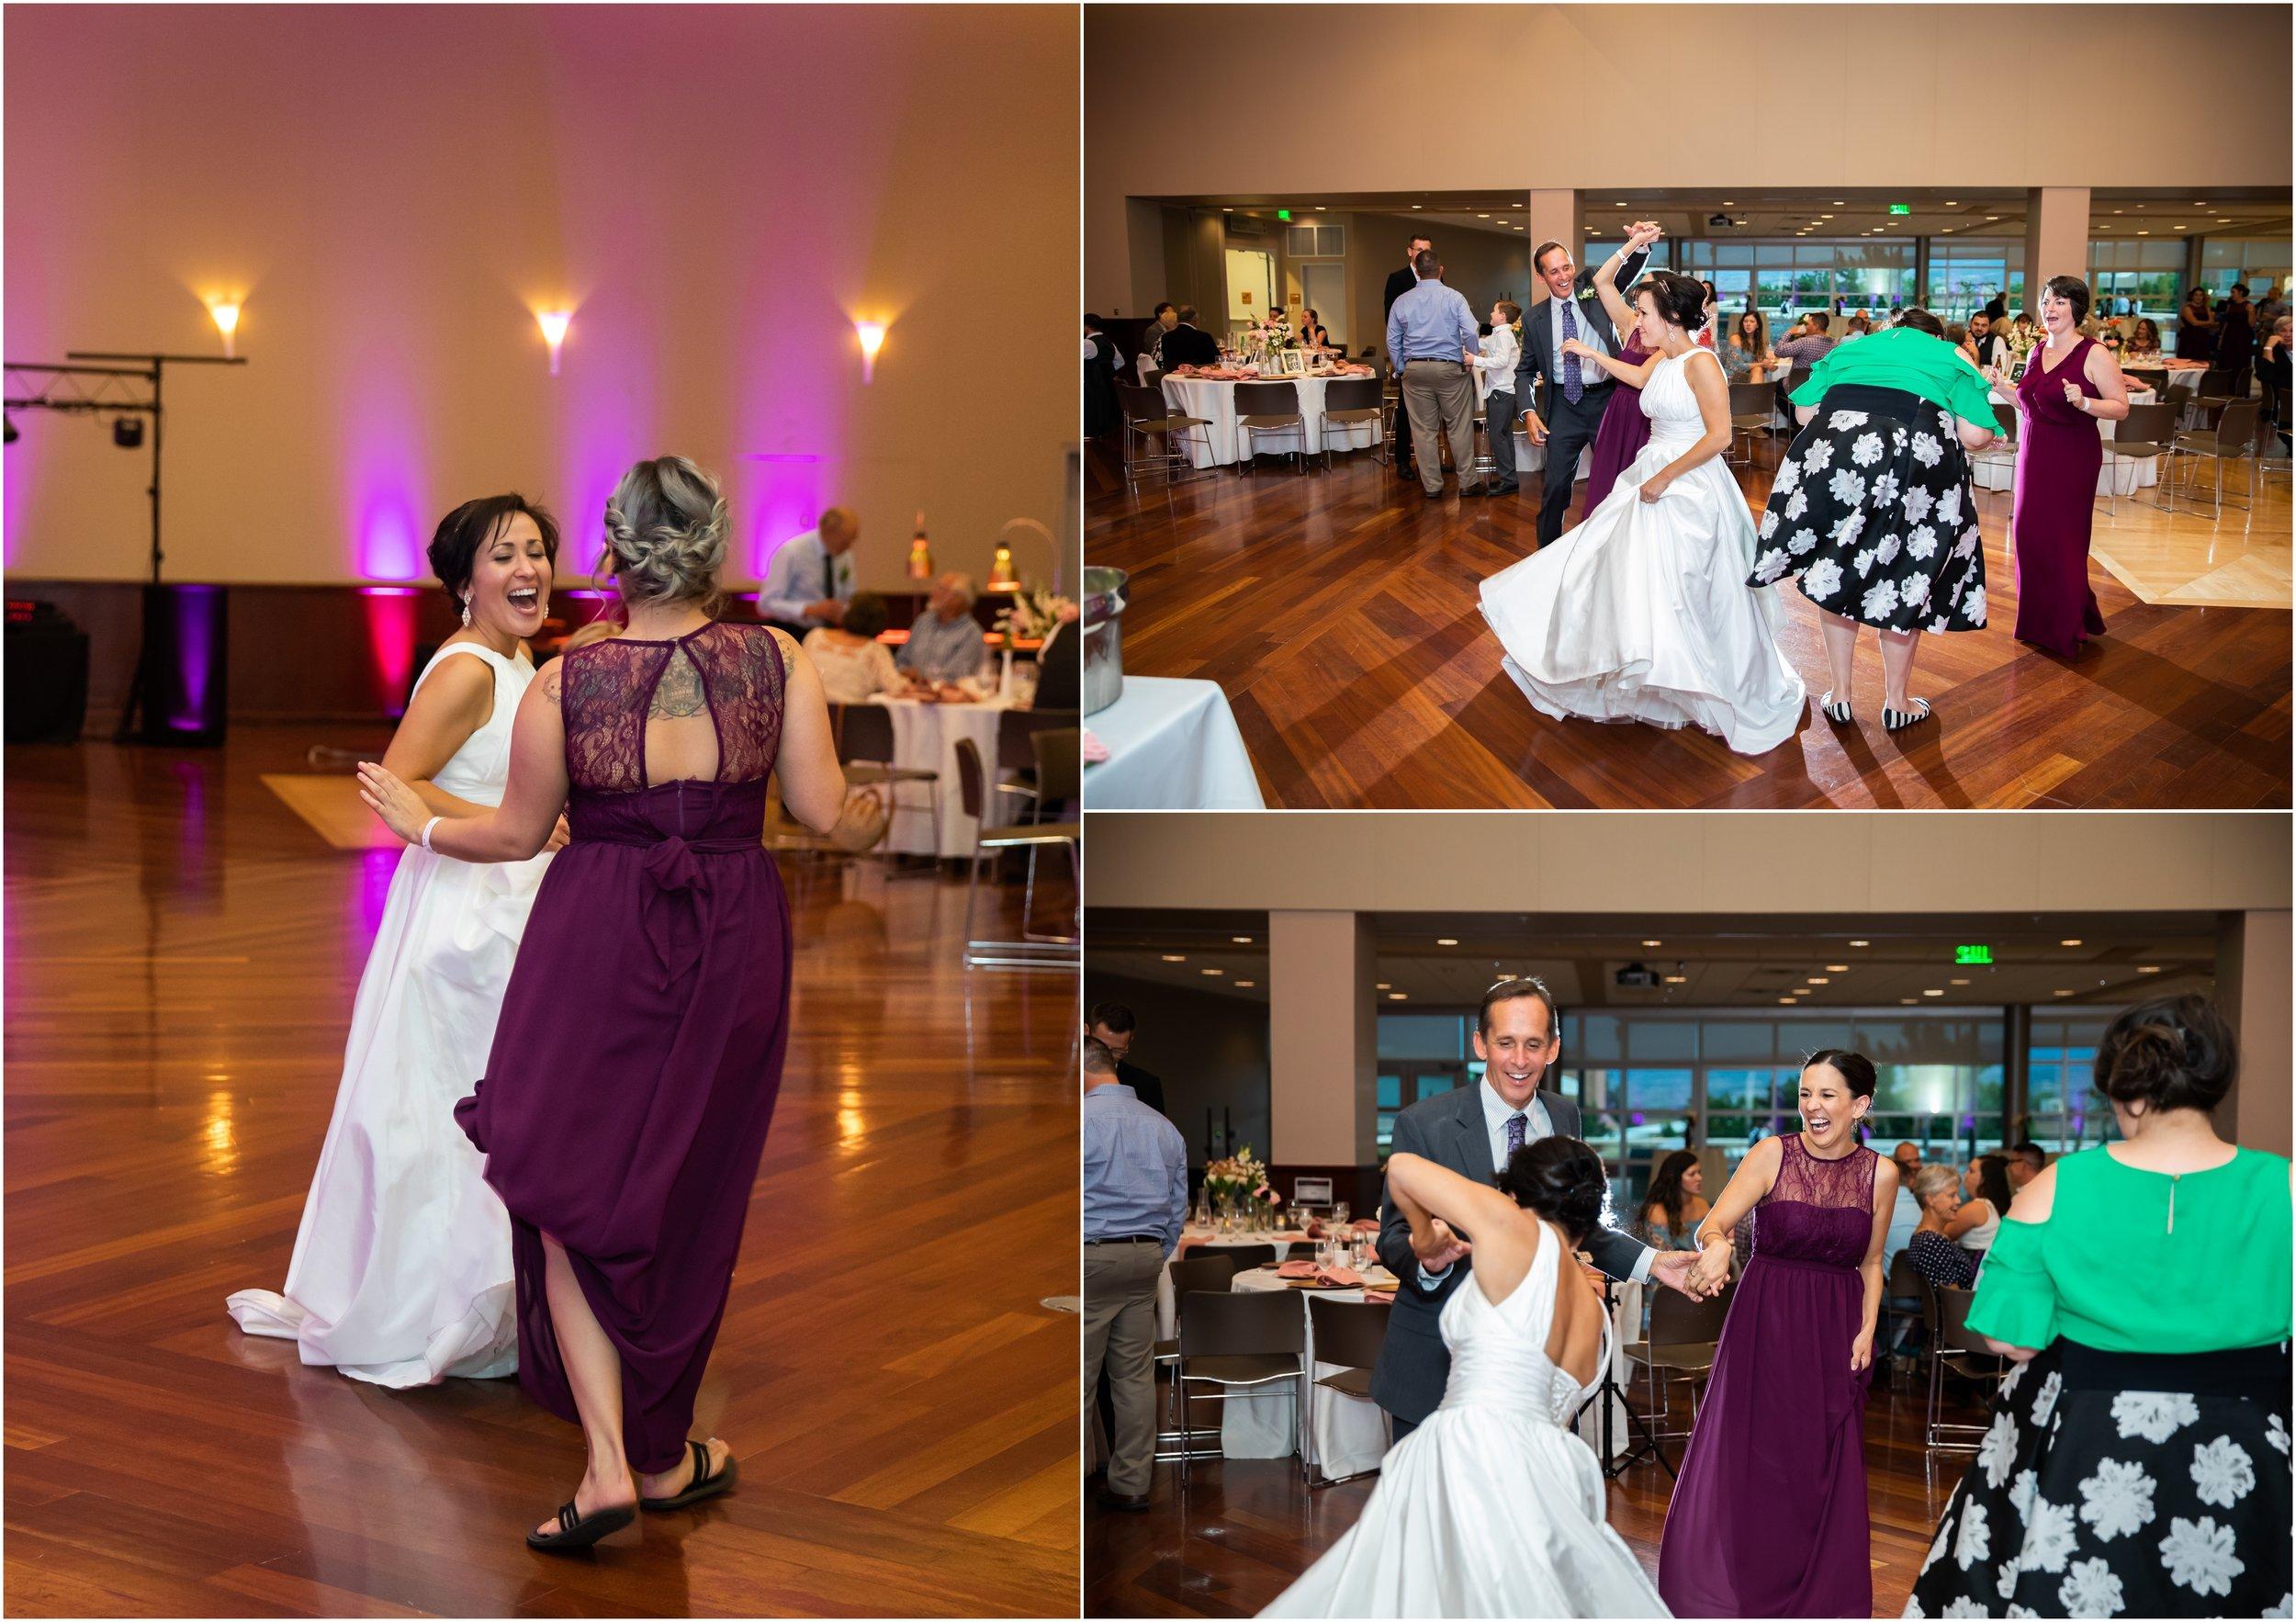 grand junction wedding photographer 38.jpg